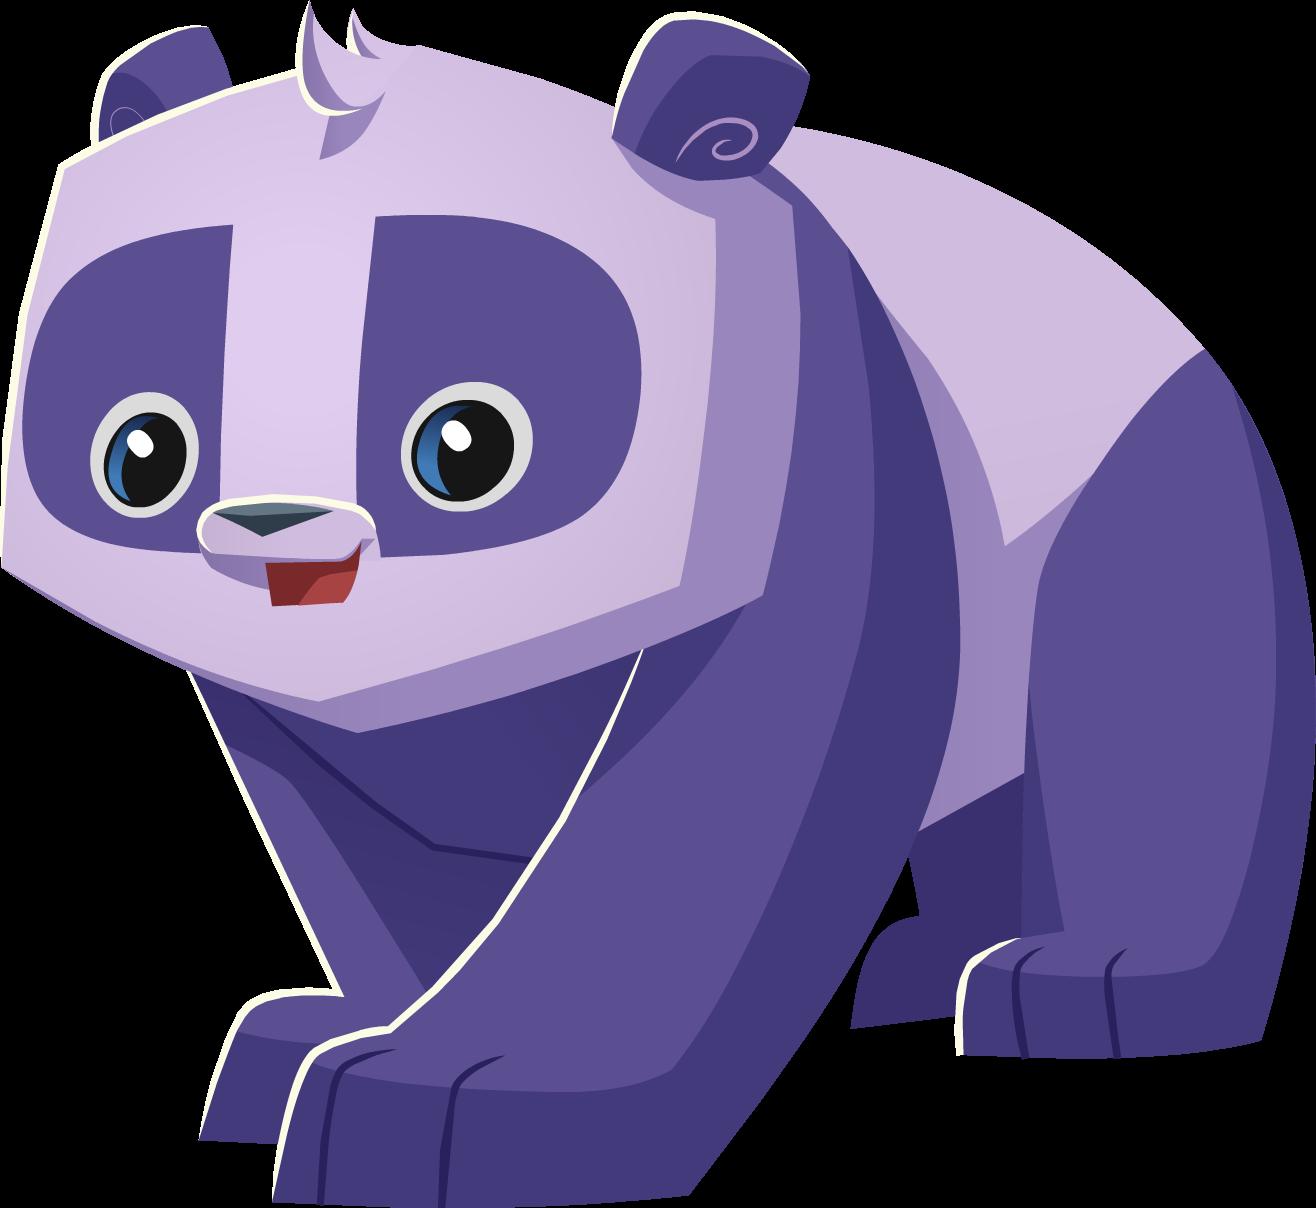 Image pink and panda. Jam clipart purple